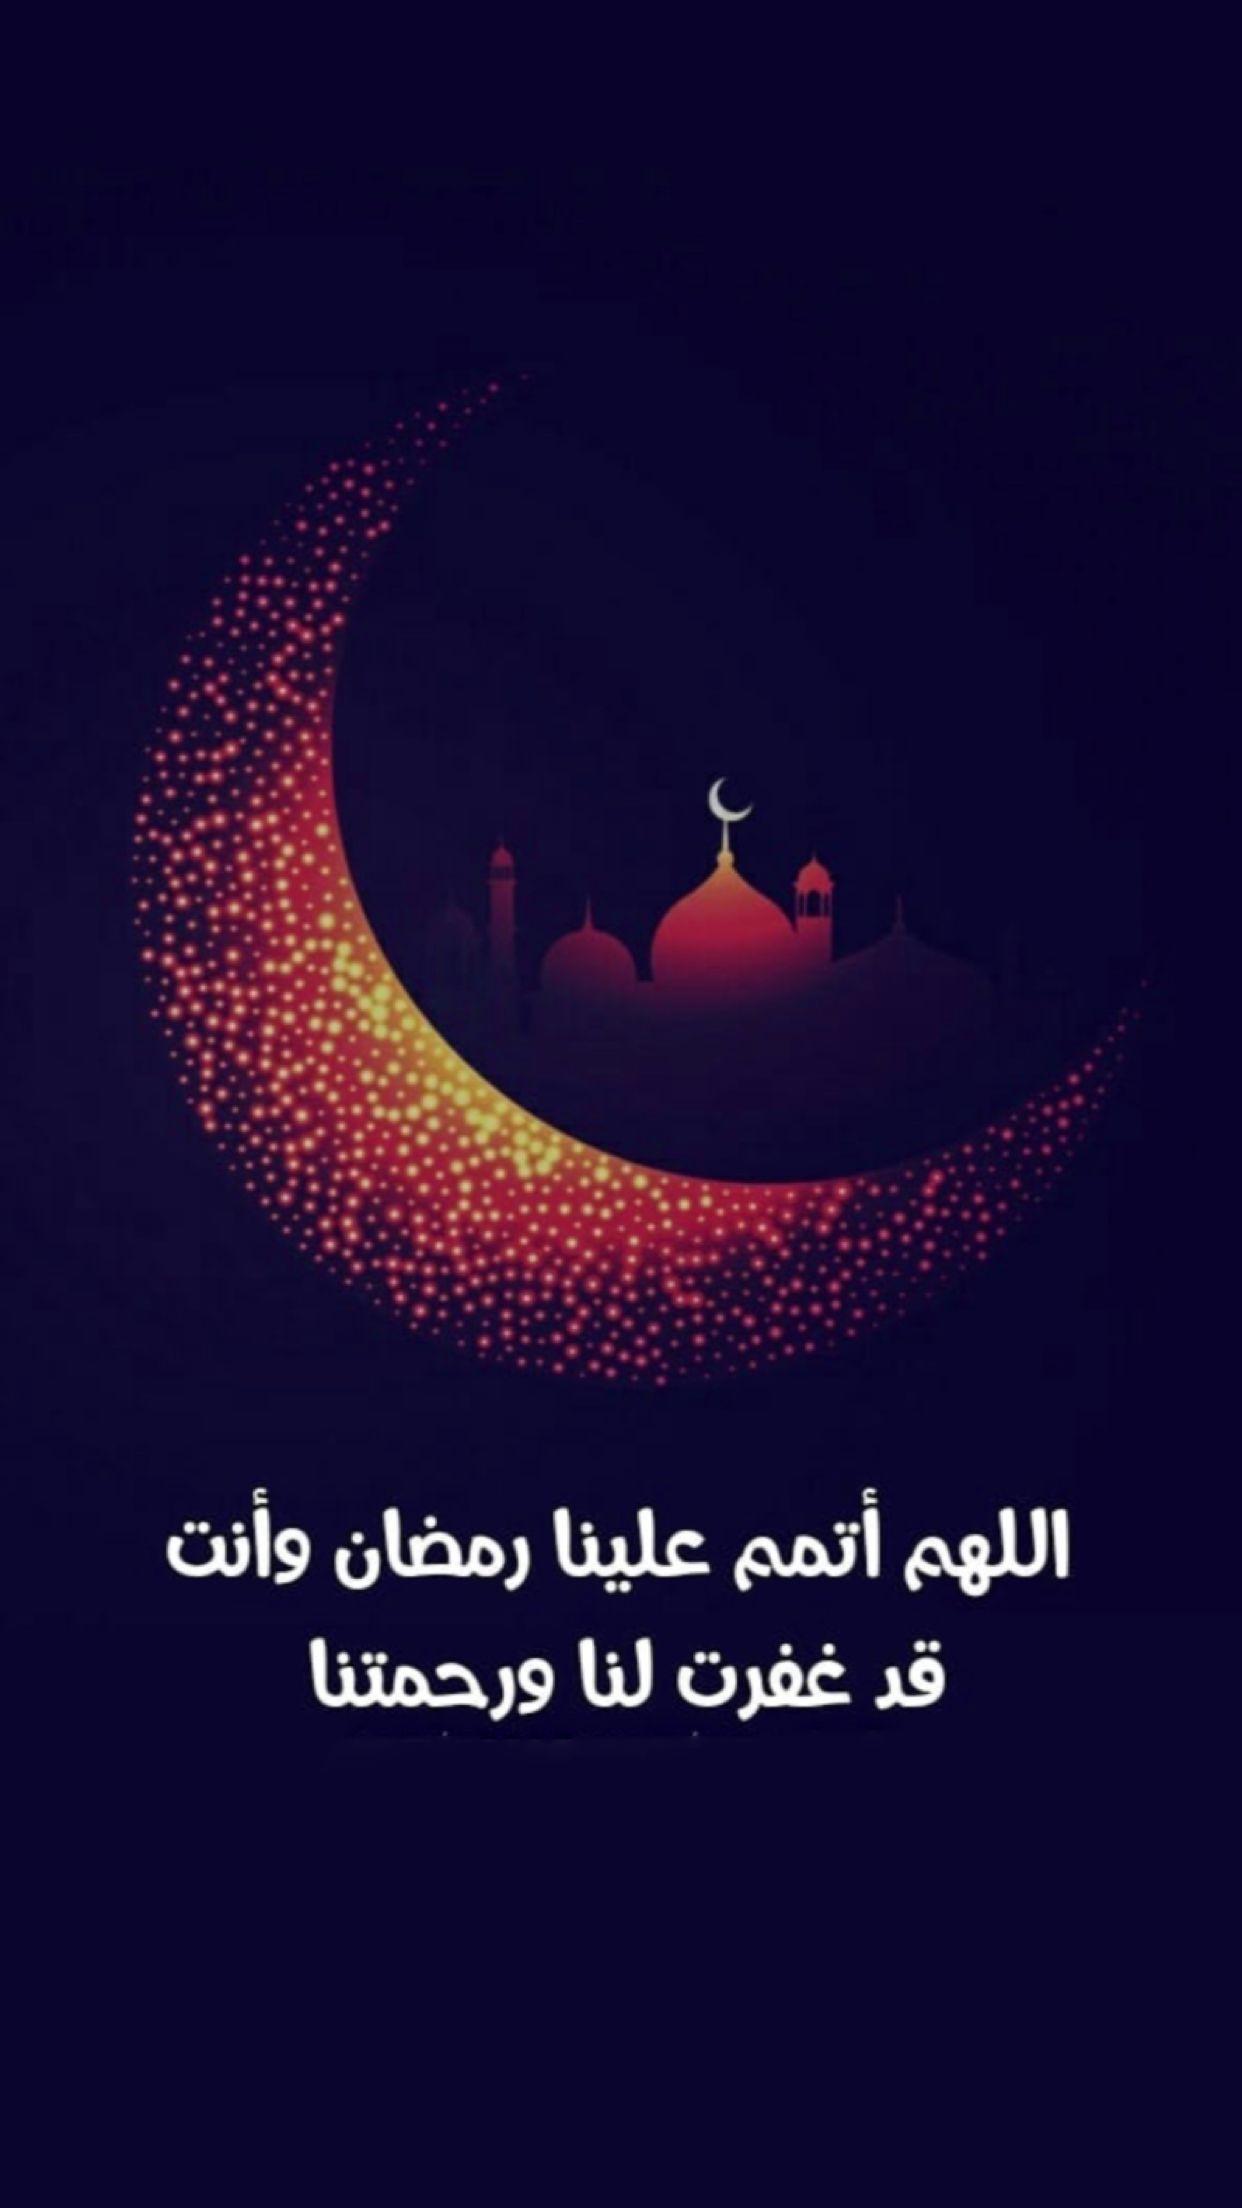 Pin By Abra On Ramadan Kareem Ramadan Quotes Ramadan Day Ramadan Kareem